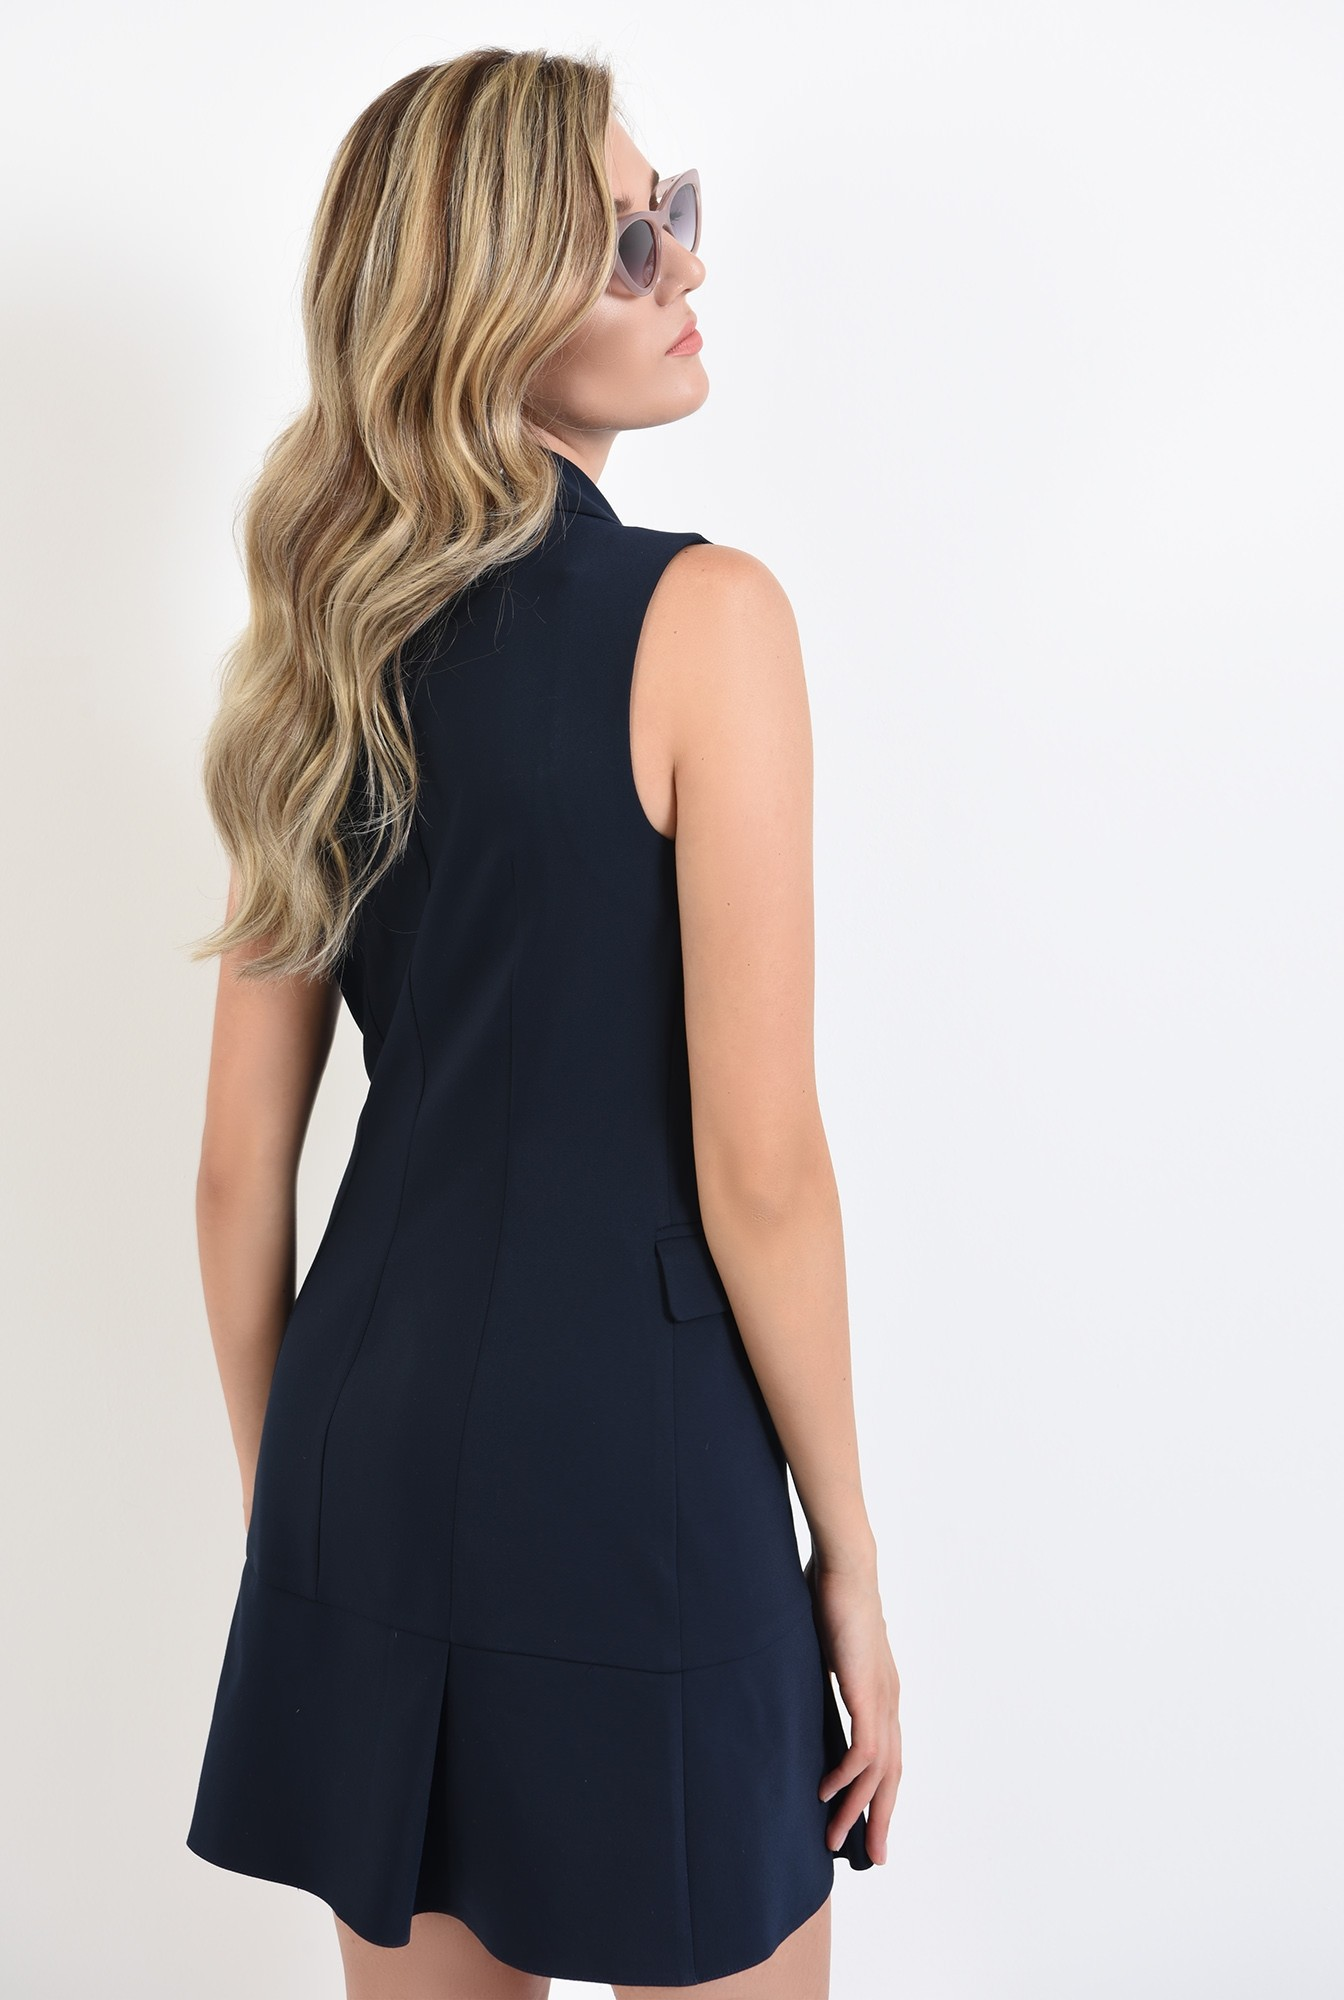 1 - 360 - rochie bleumarin, scurta, tip sacou, Poema